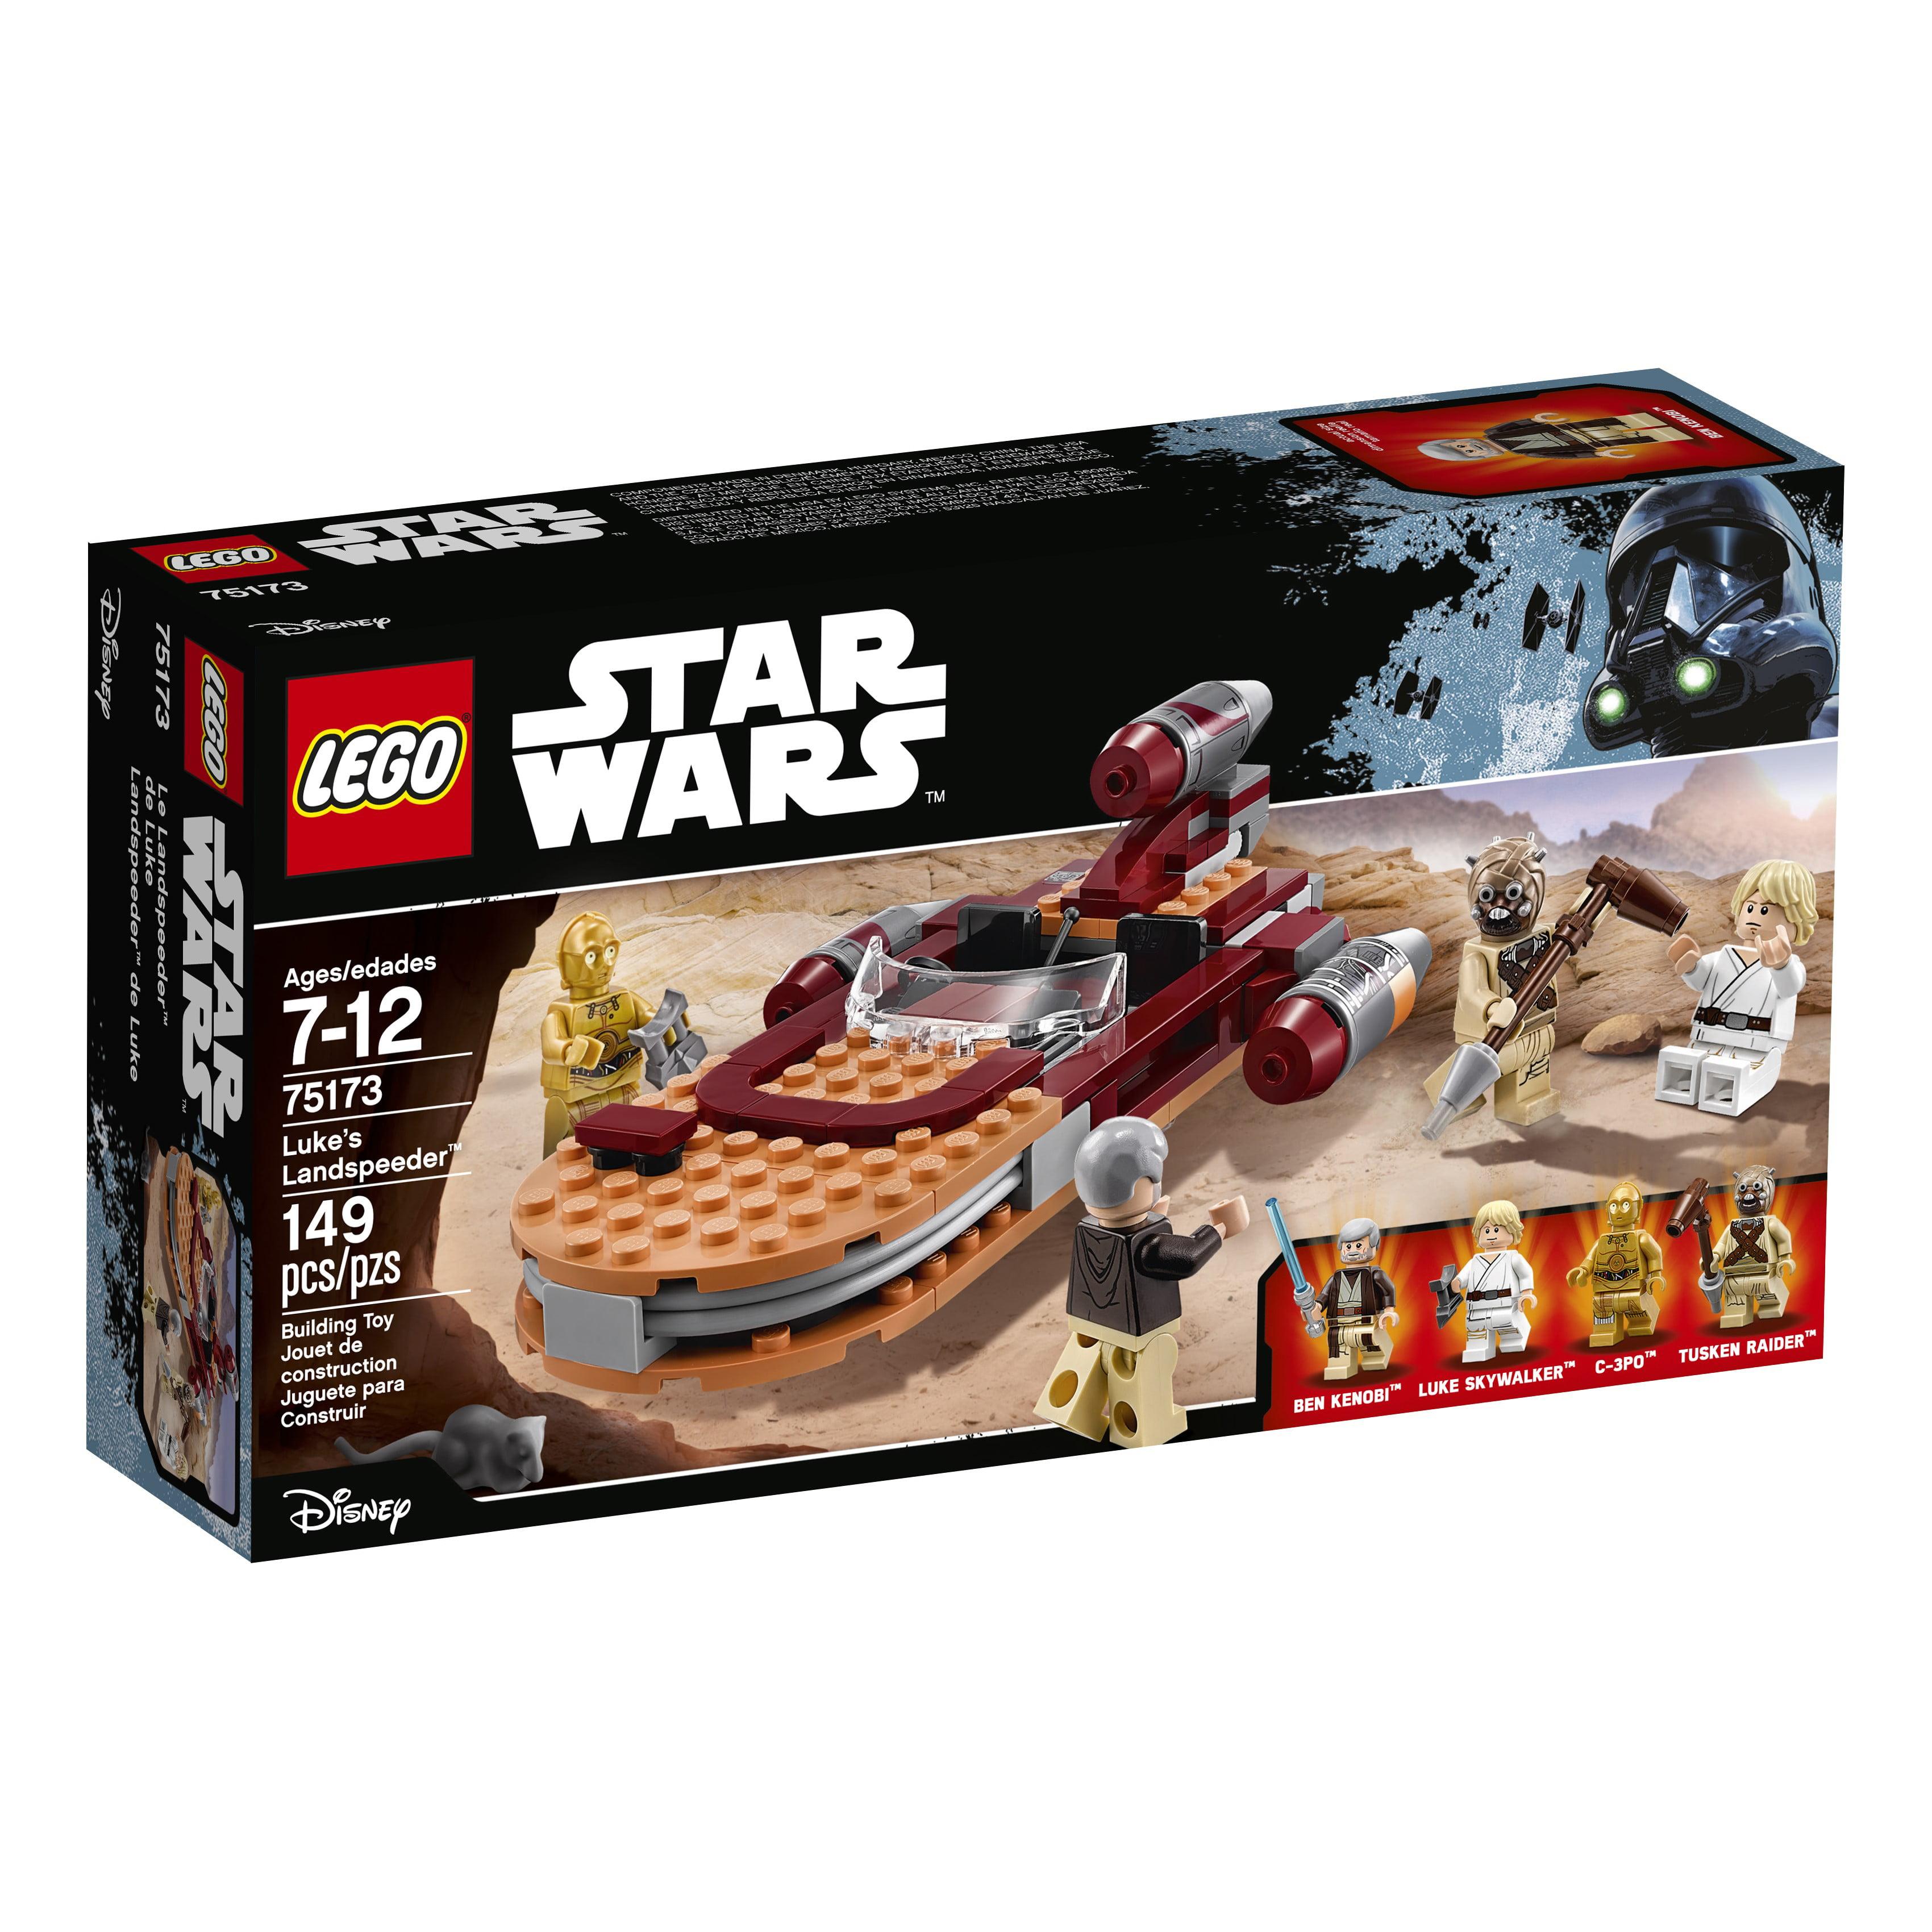 LEGO Star Wars Luke's Landspeeder 75173